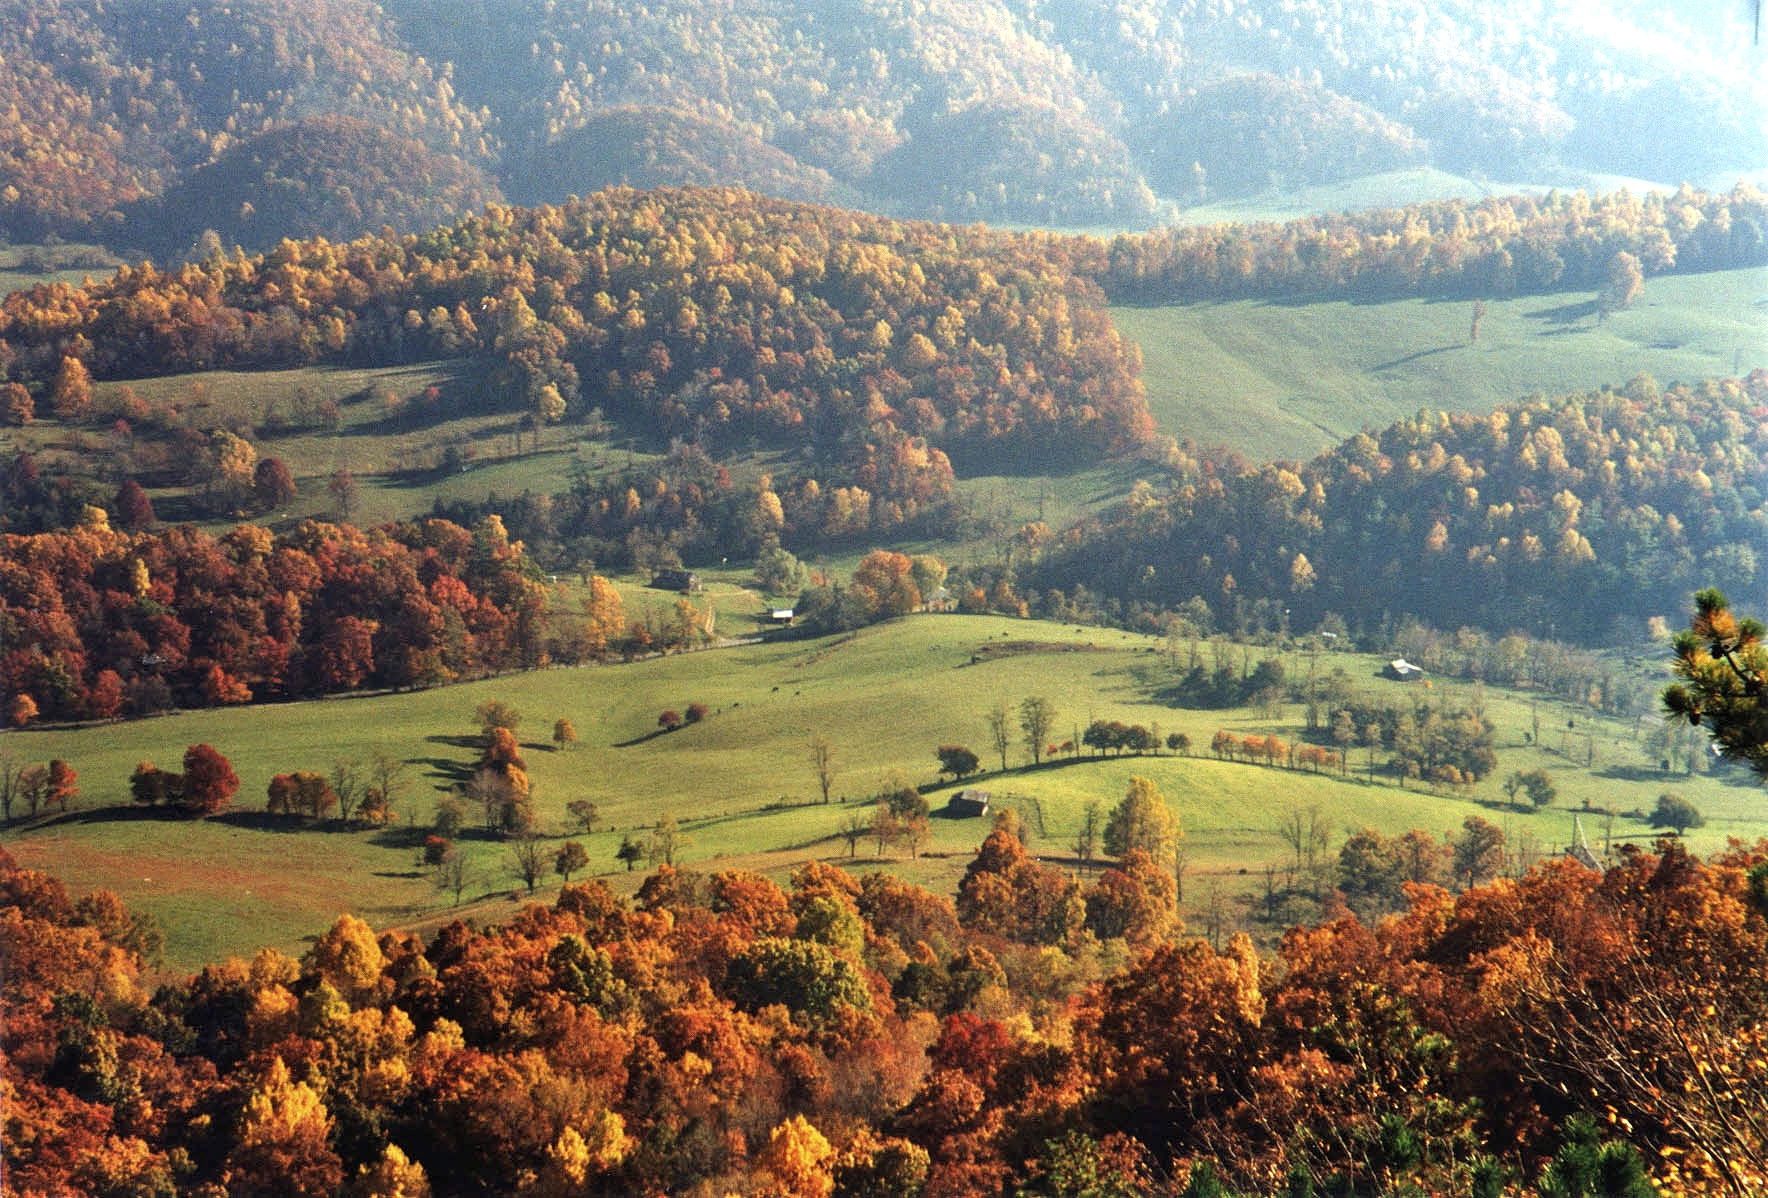 18 Photos Of Beautiful Rural Virginia